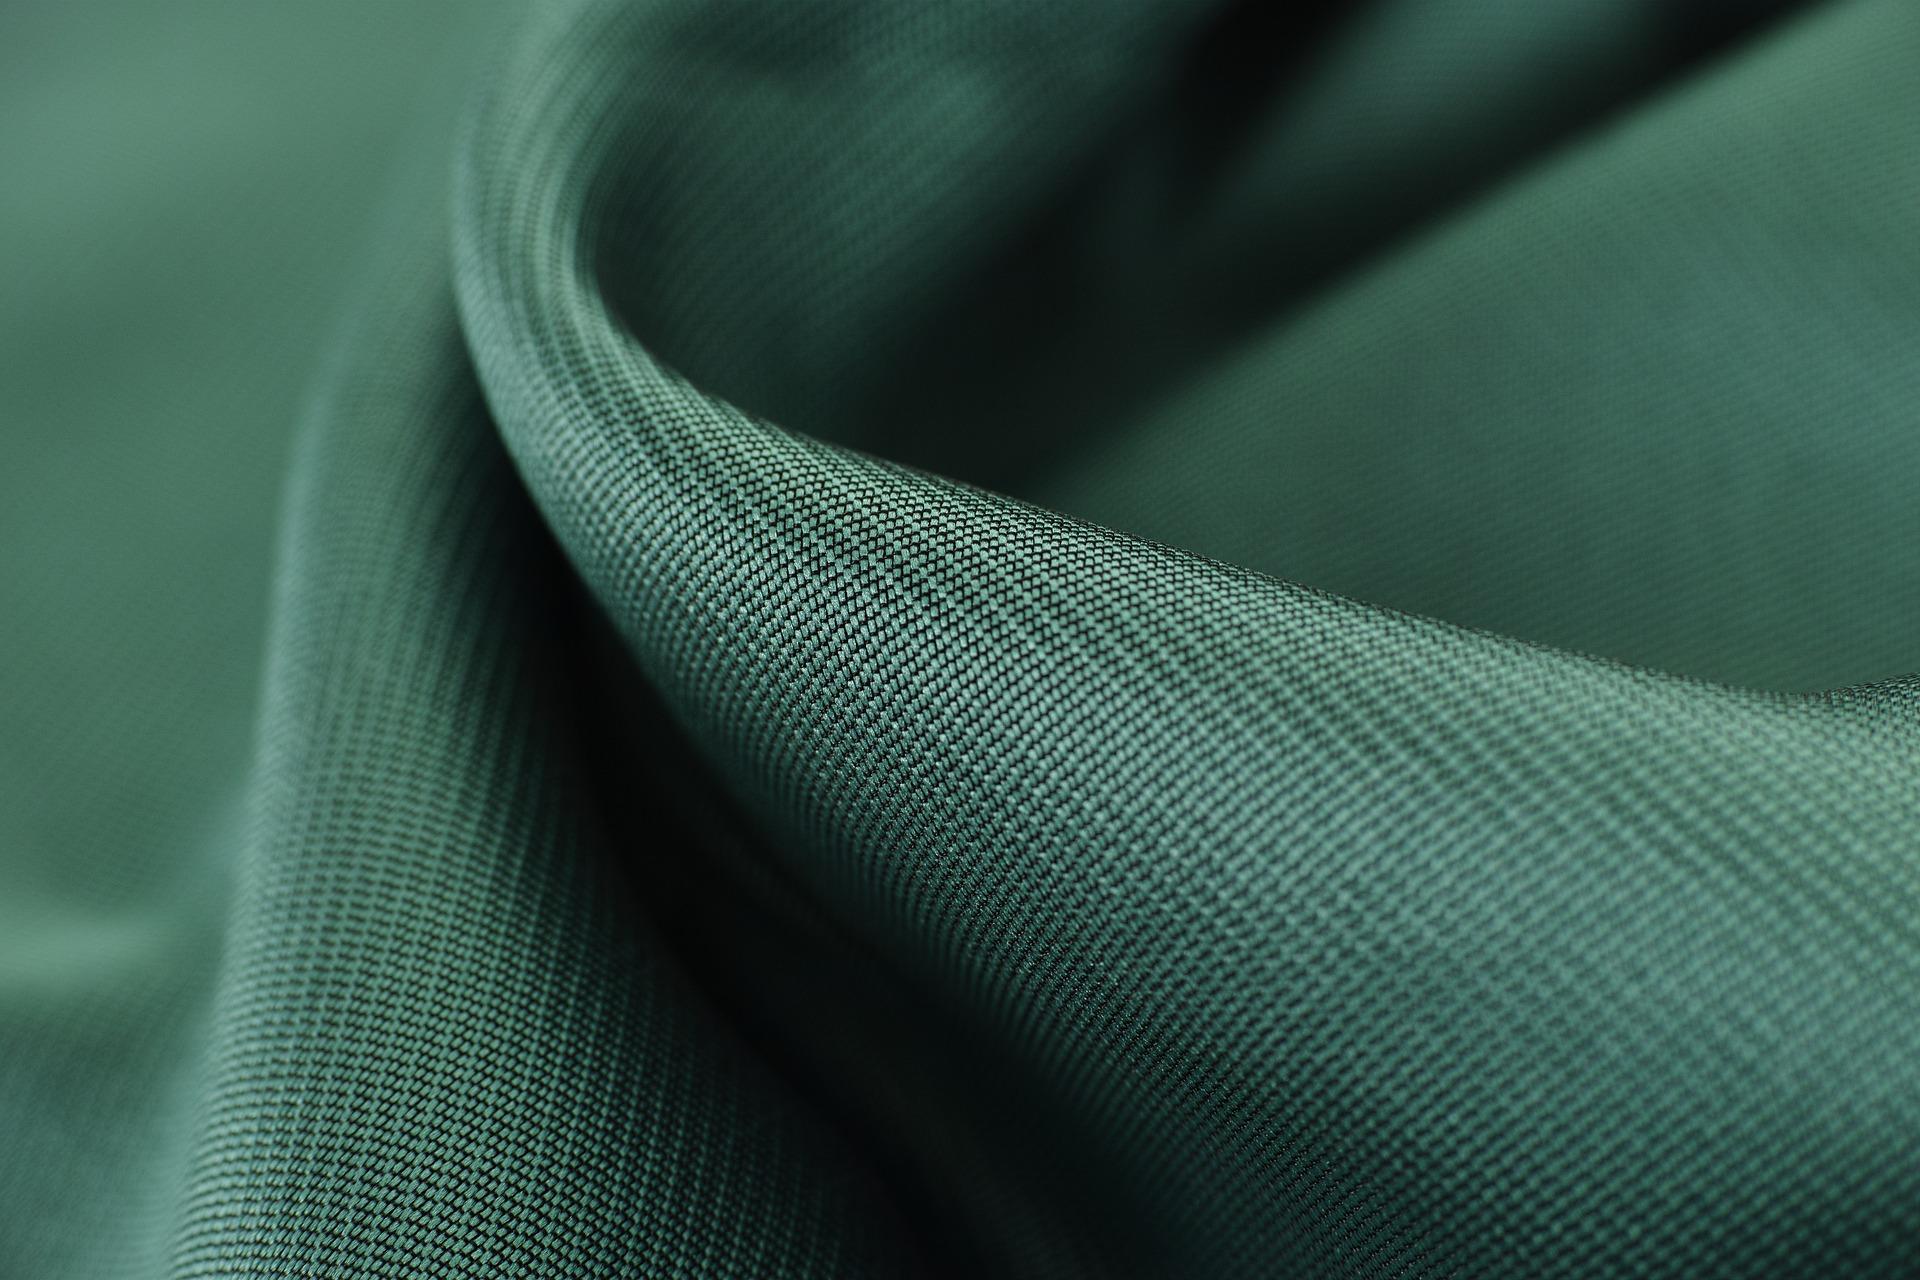 textile 1824190 1920 - Eficiencia sin fronteras: Datamonplus acompaña a empresas latinoamericanas a elevarlas a Categoría Mundial